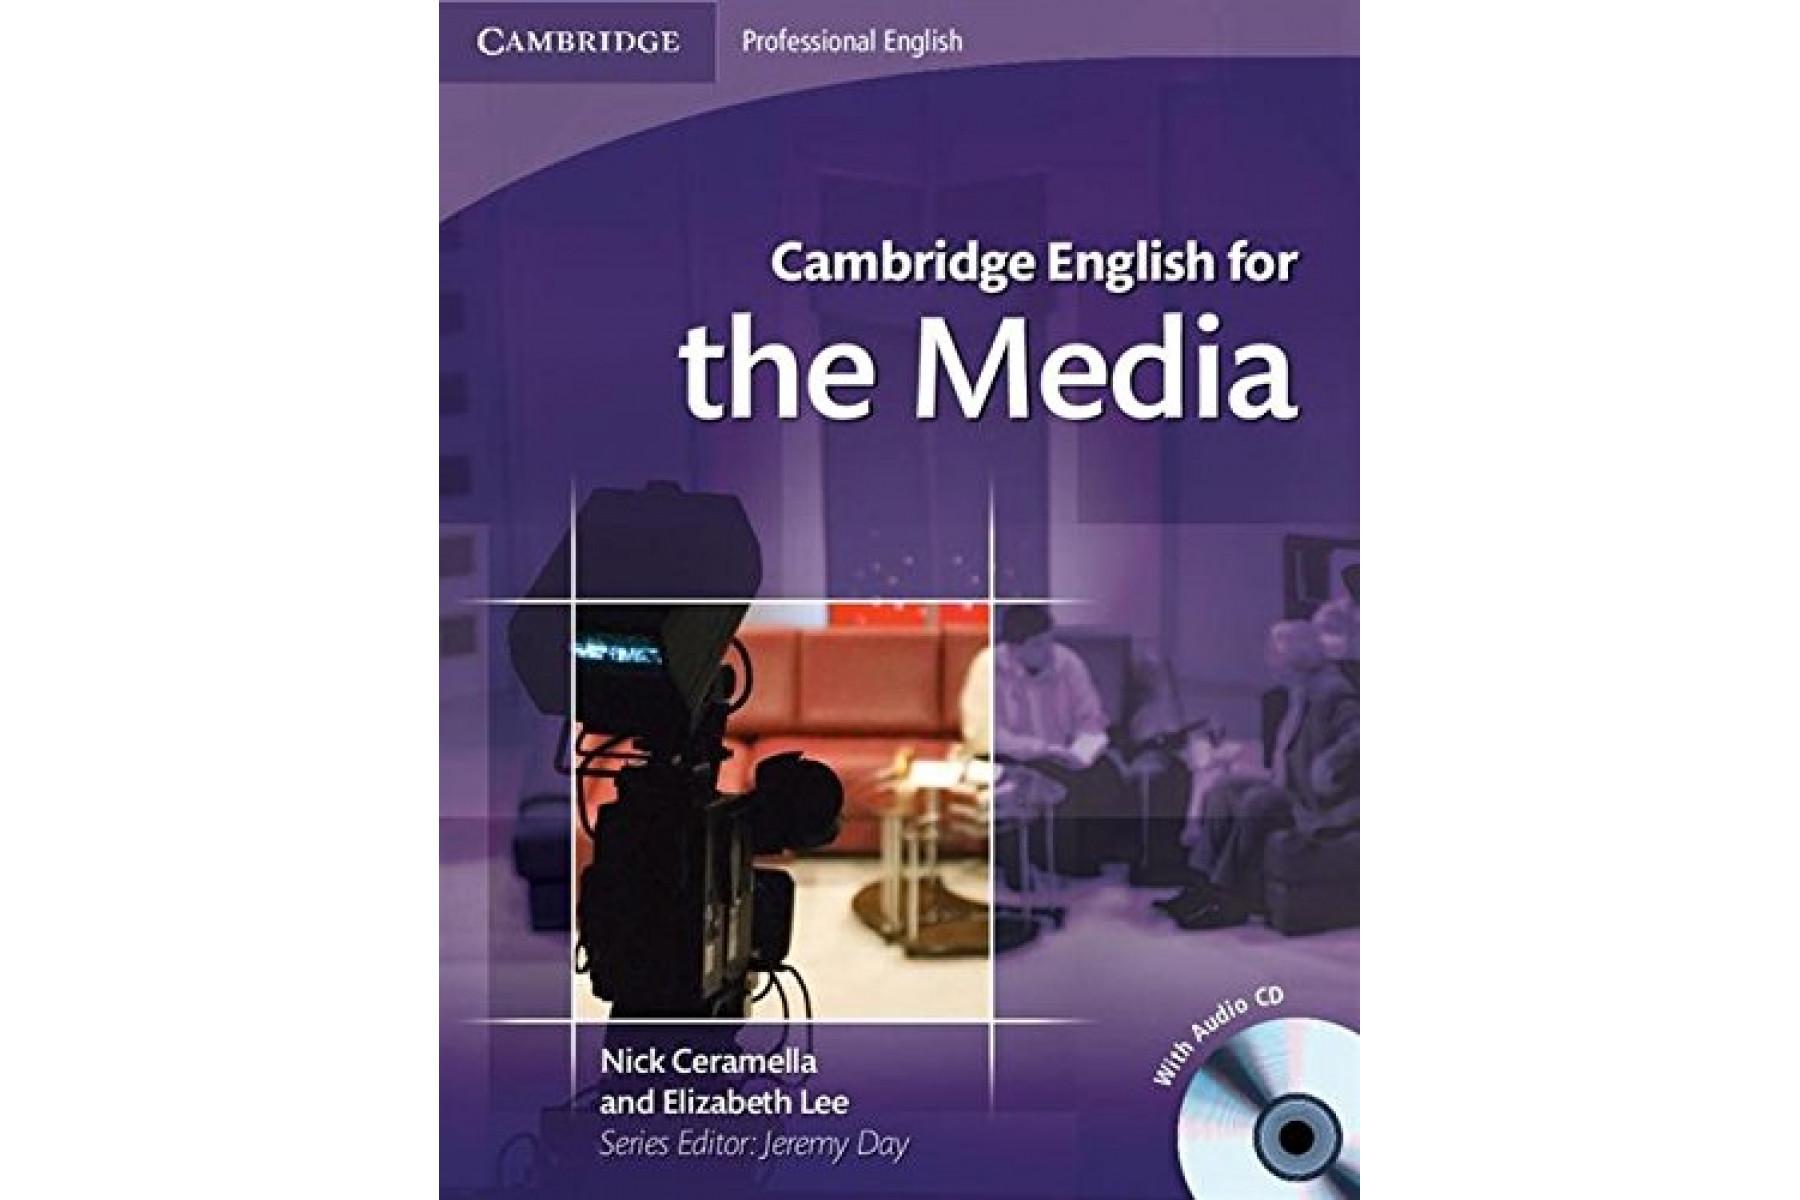 Cambridge English for the Media